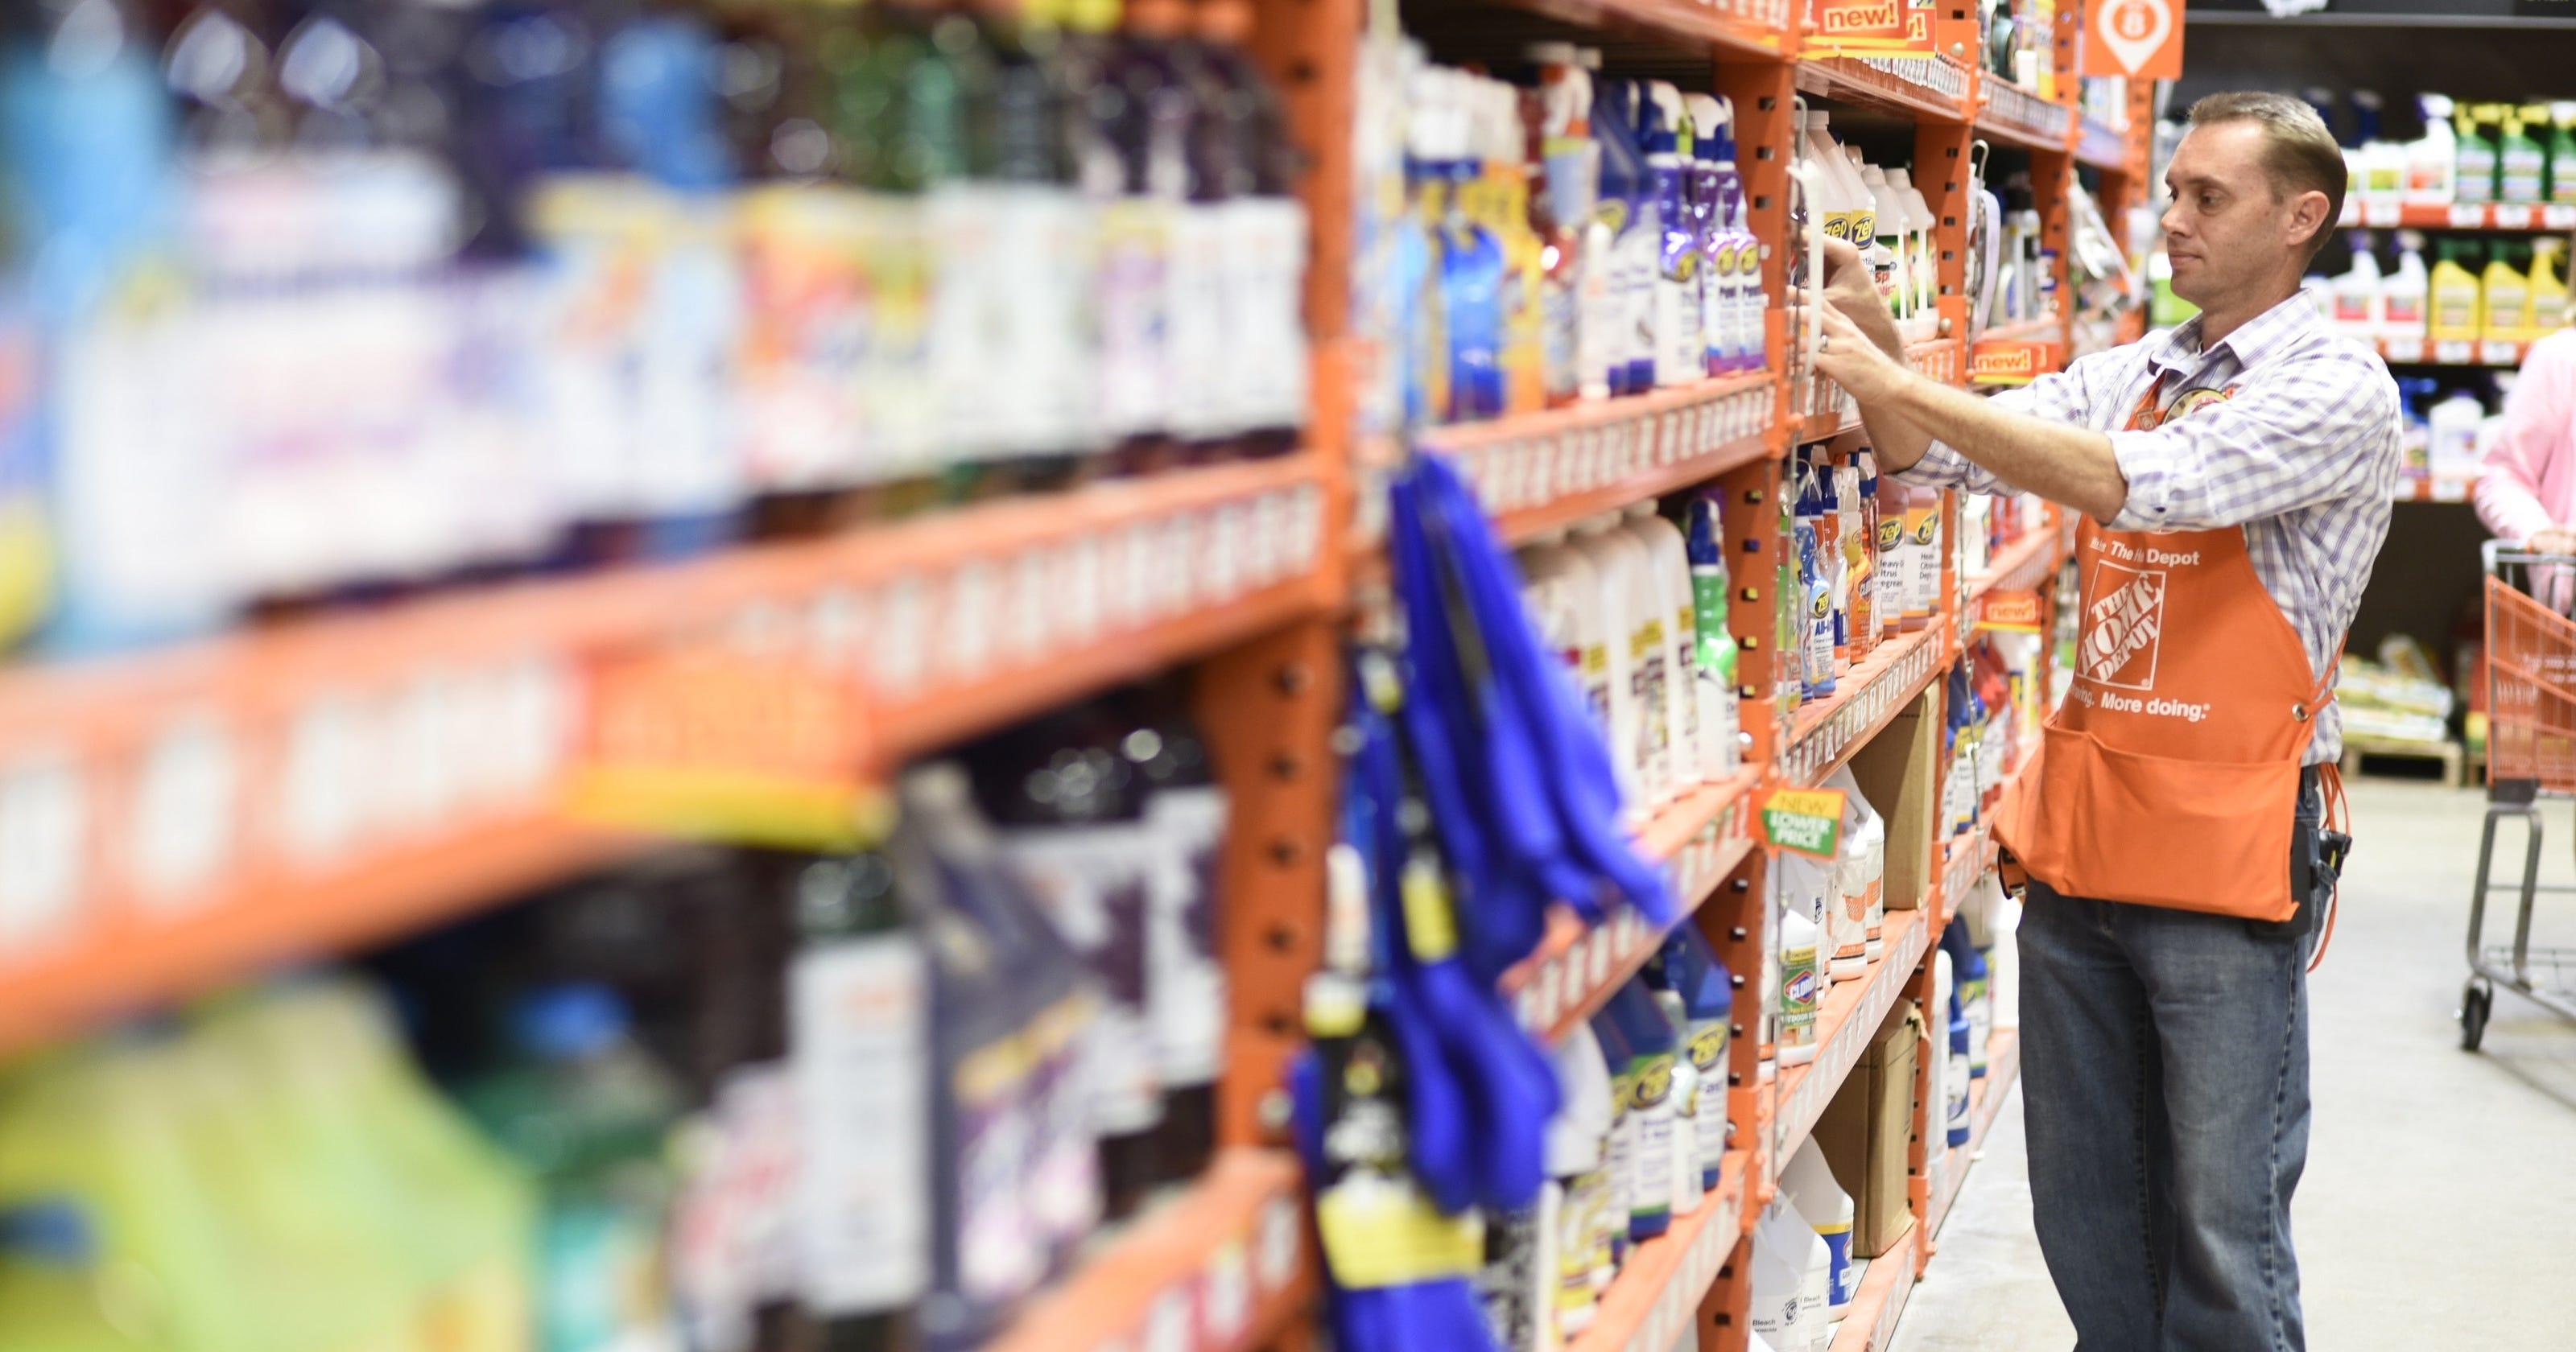 The Best Home Depot Black Friday Deals You Can Still Get